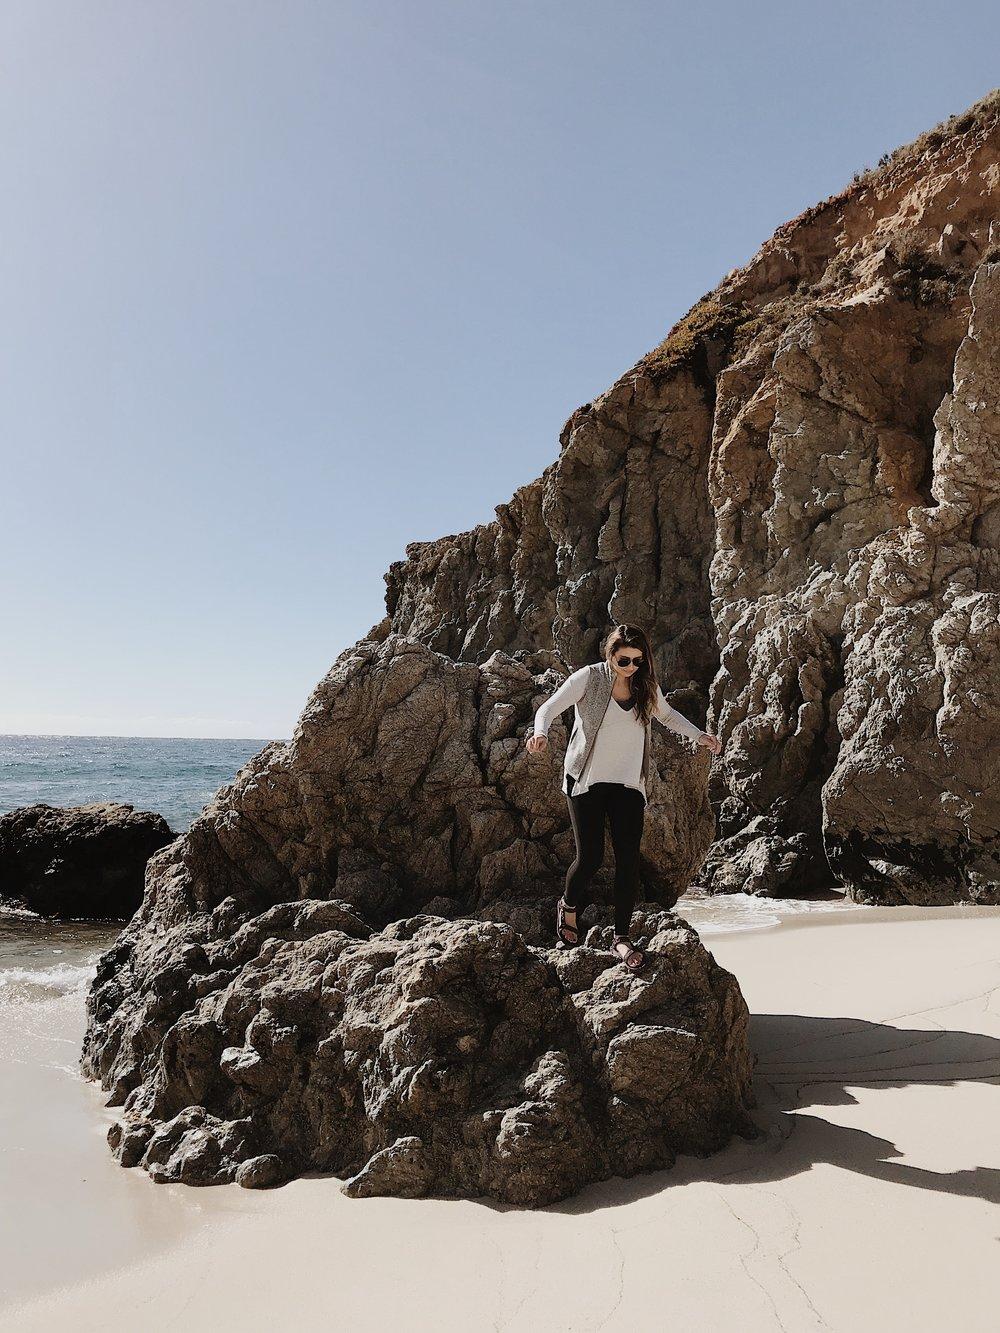 big-sur-gibson-beach-visit.JPG